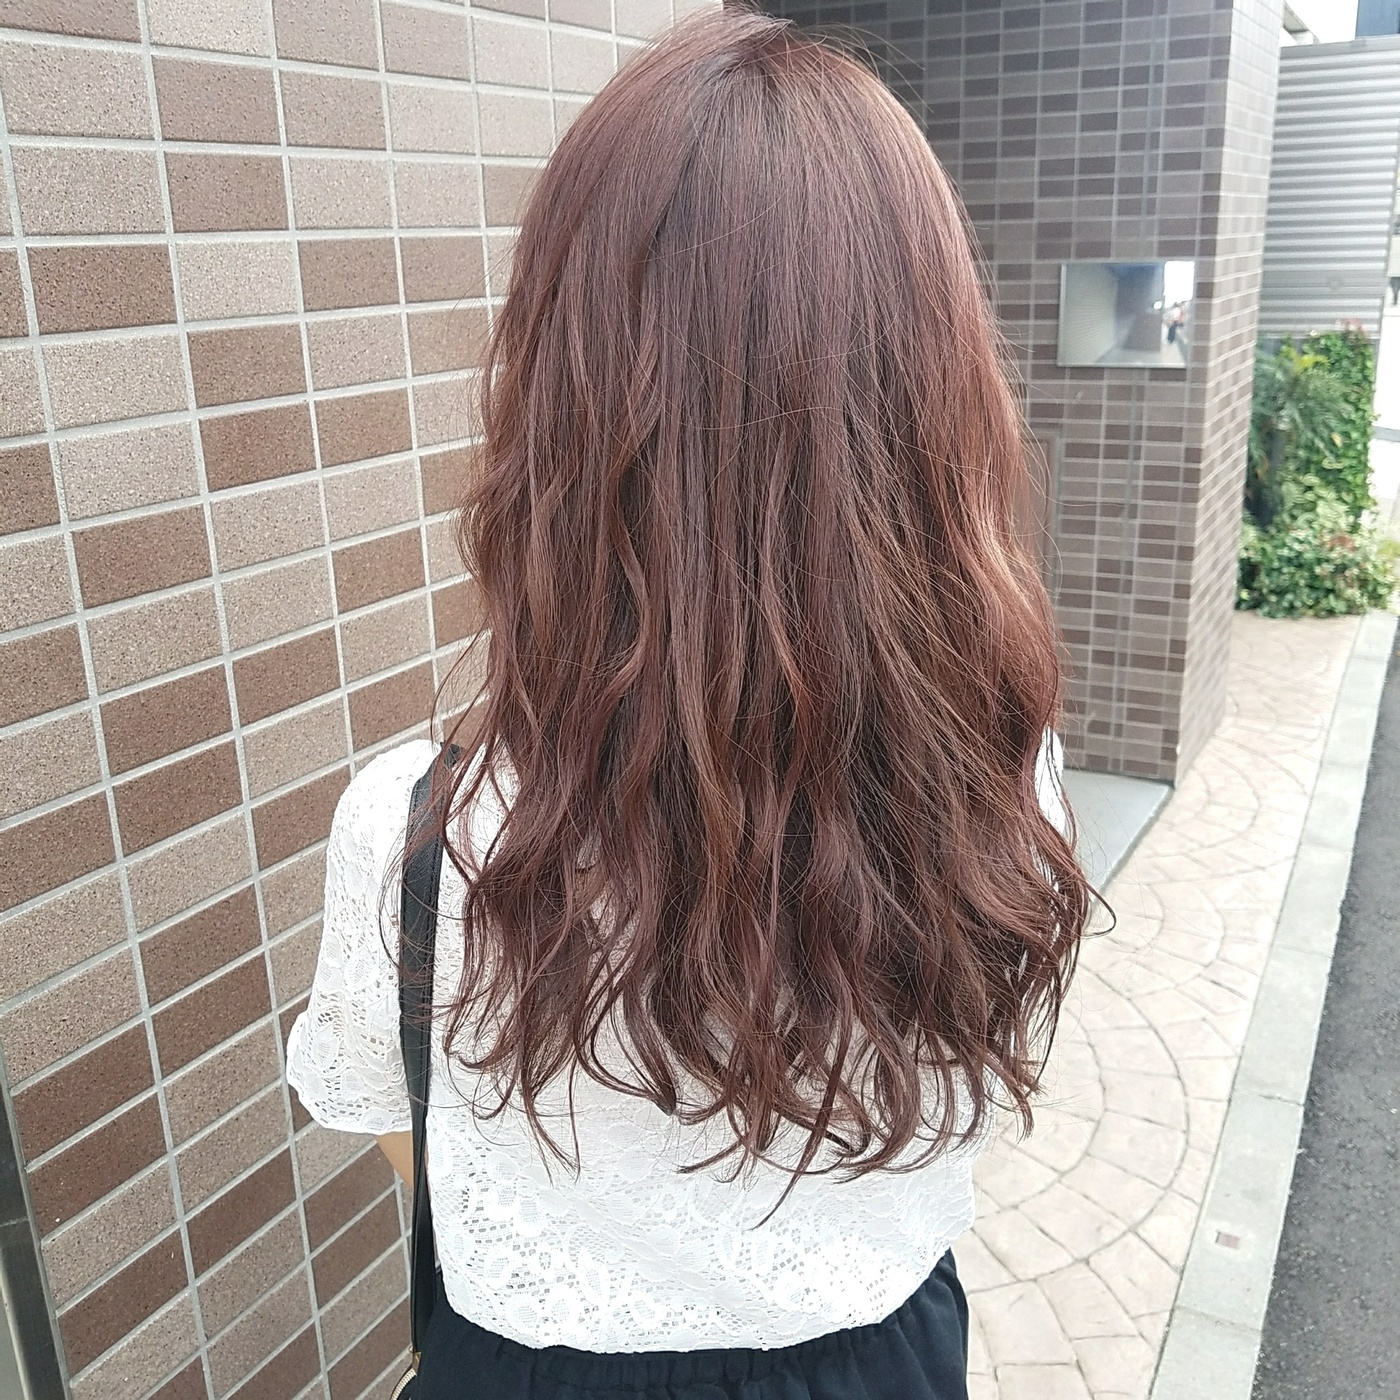 harasho66 (ヘアスタジオ カンテラ[Hair Studio Cantera]所属)